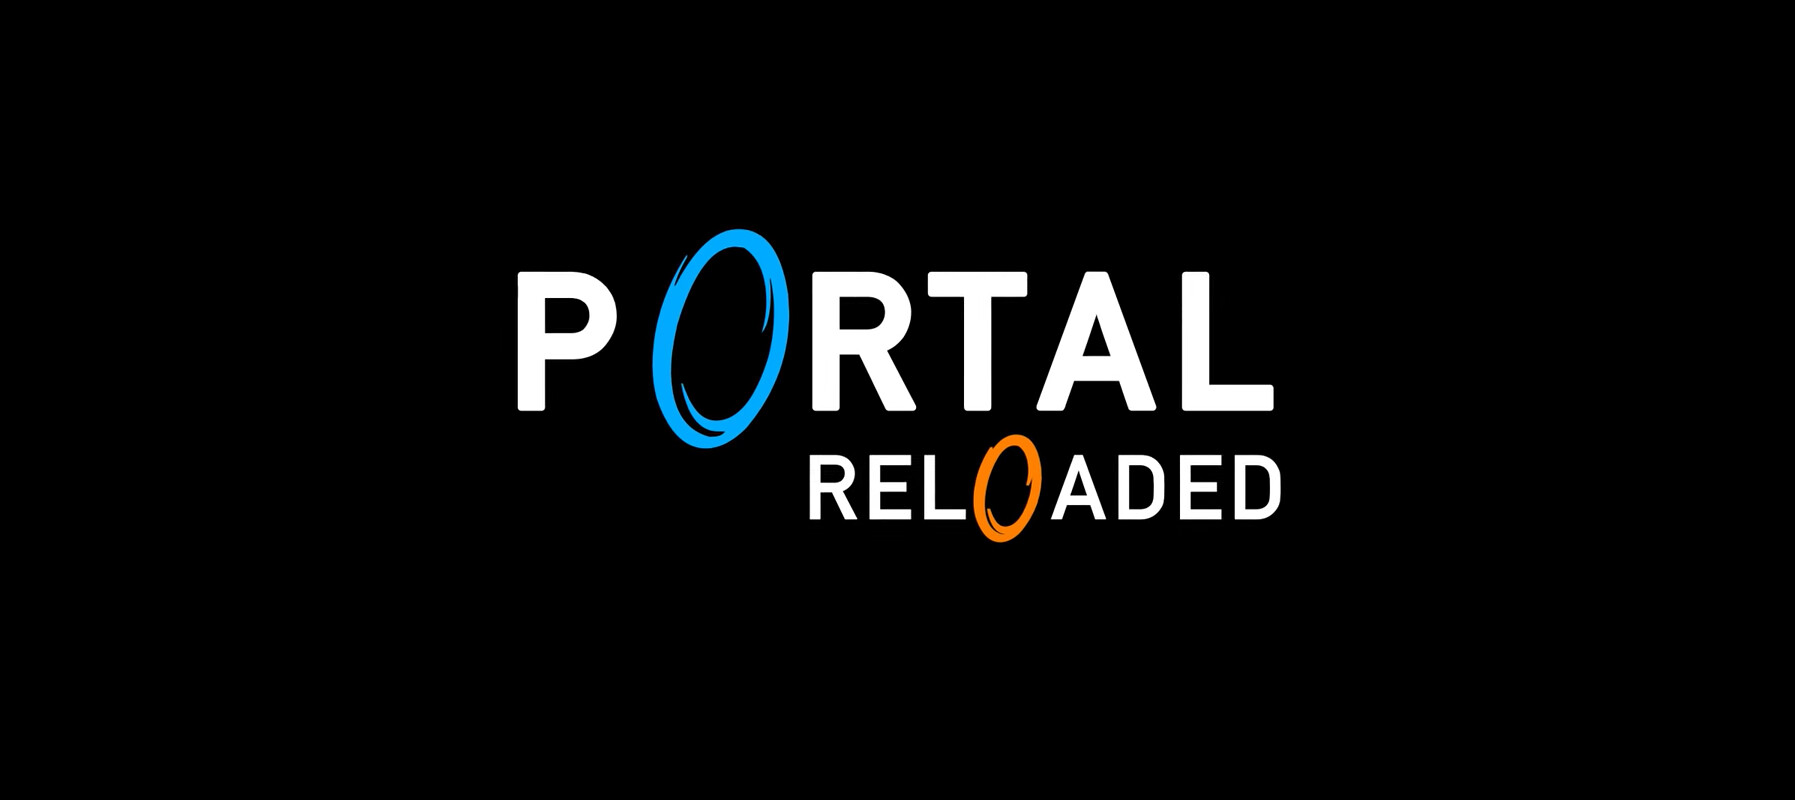 Portal Reloaded Fan Mod agrega 25 cámaras de prueba, portal de viaje en el tiempo a Valve Classic Portal 2